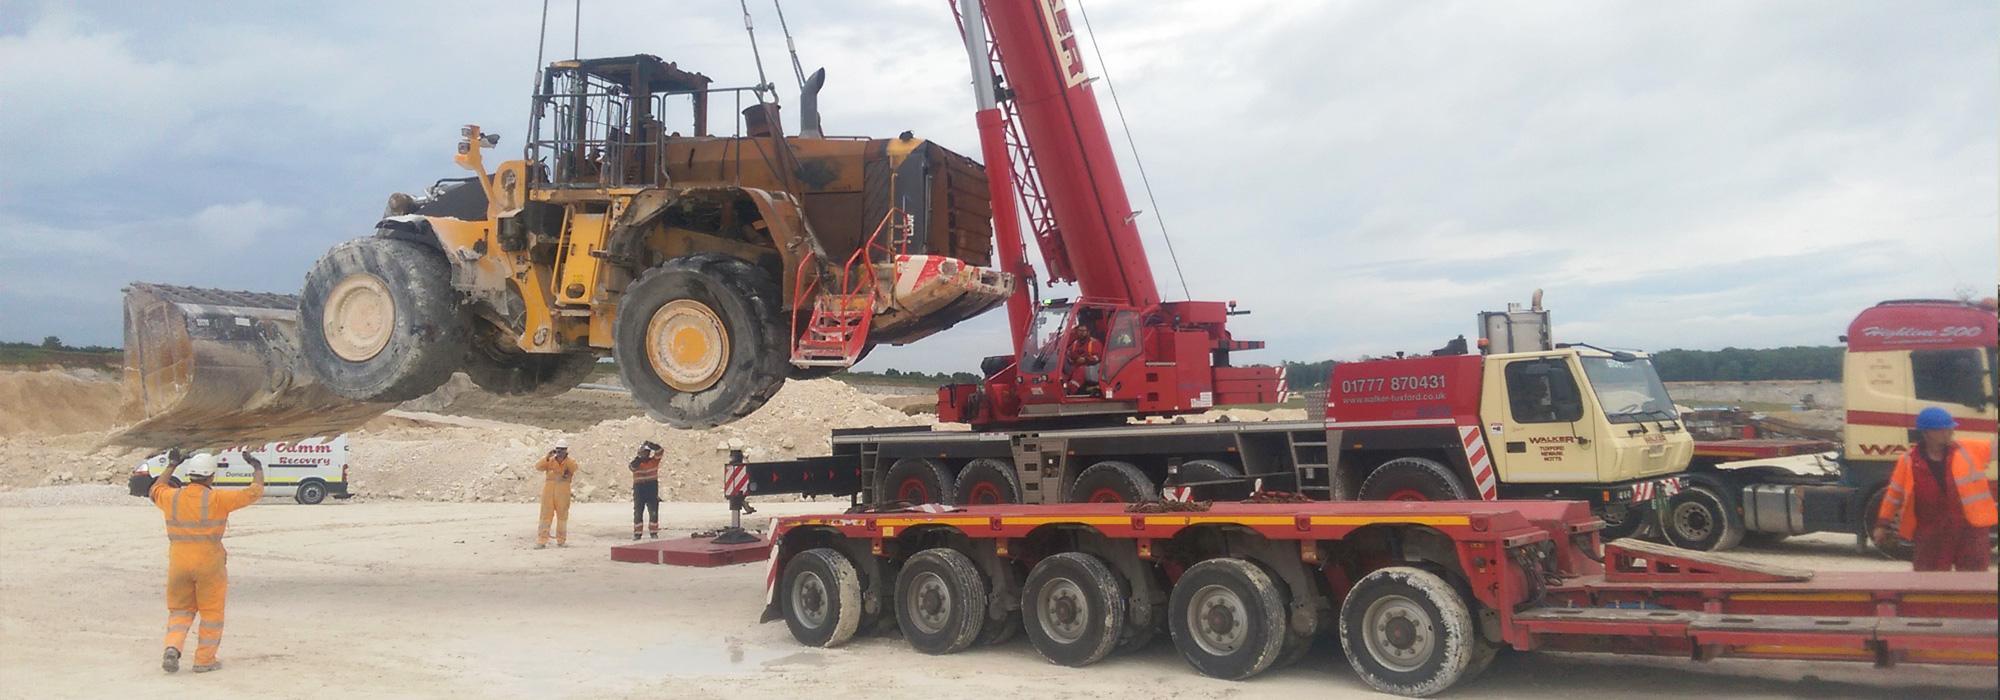 UK & European Haulage, Crane Hire, Machinery Removals